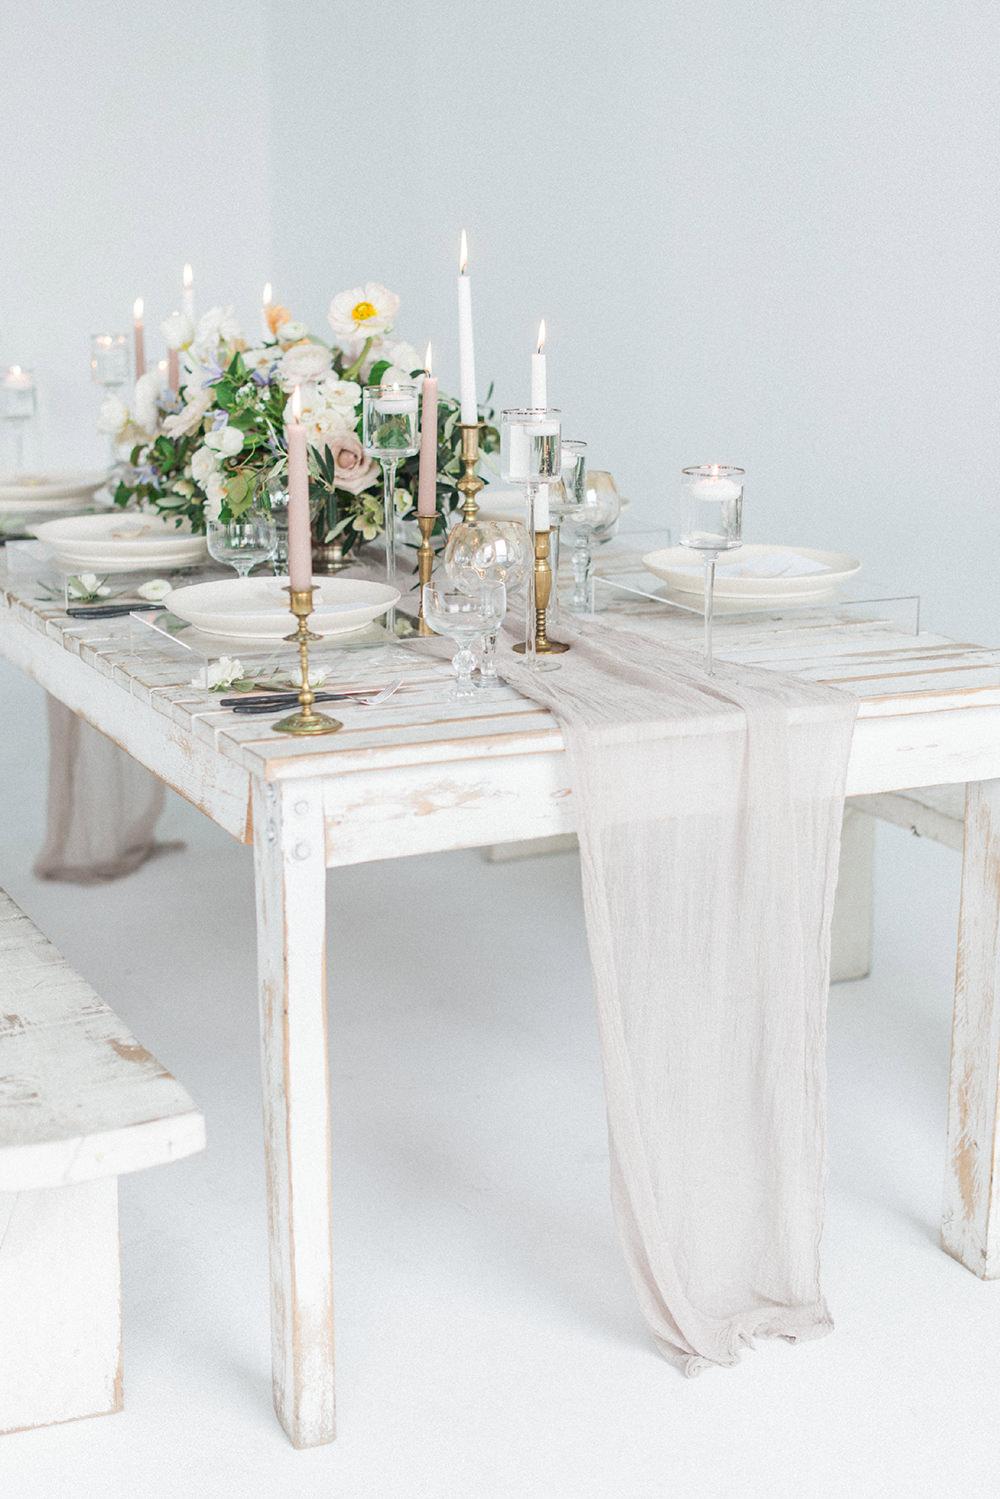 table runners - photo by Laura Kelly Photography https://ruffledblog.com/minimalist-monochrome-european-wedding-inspiration